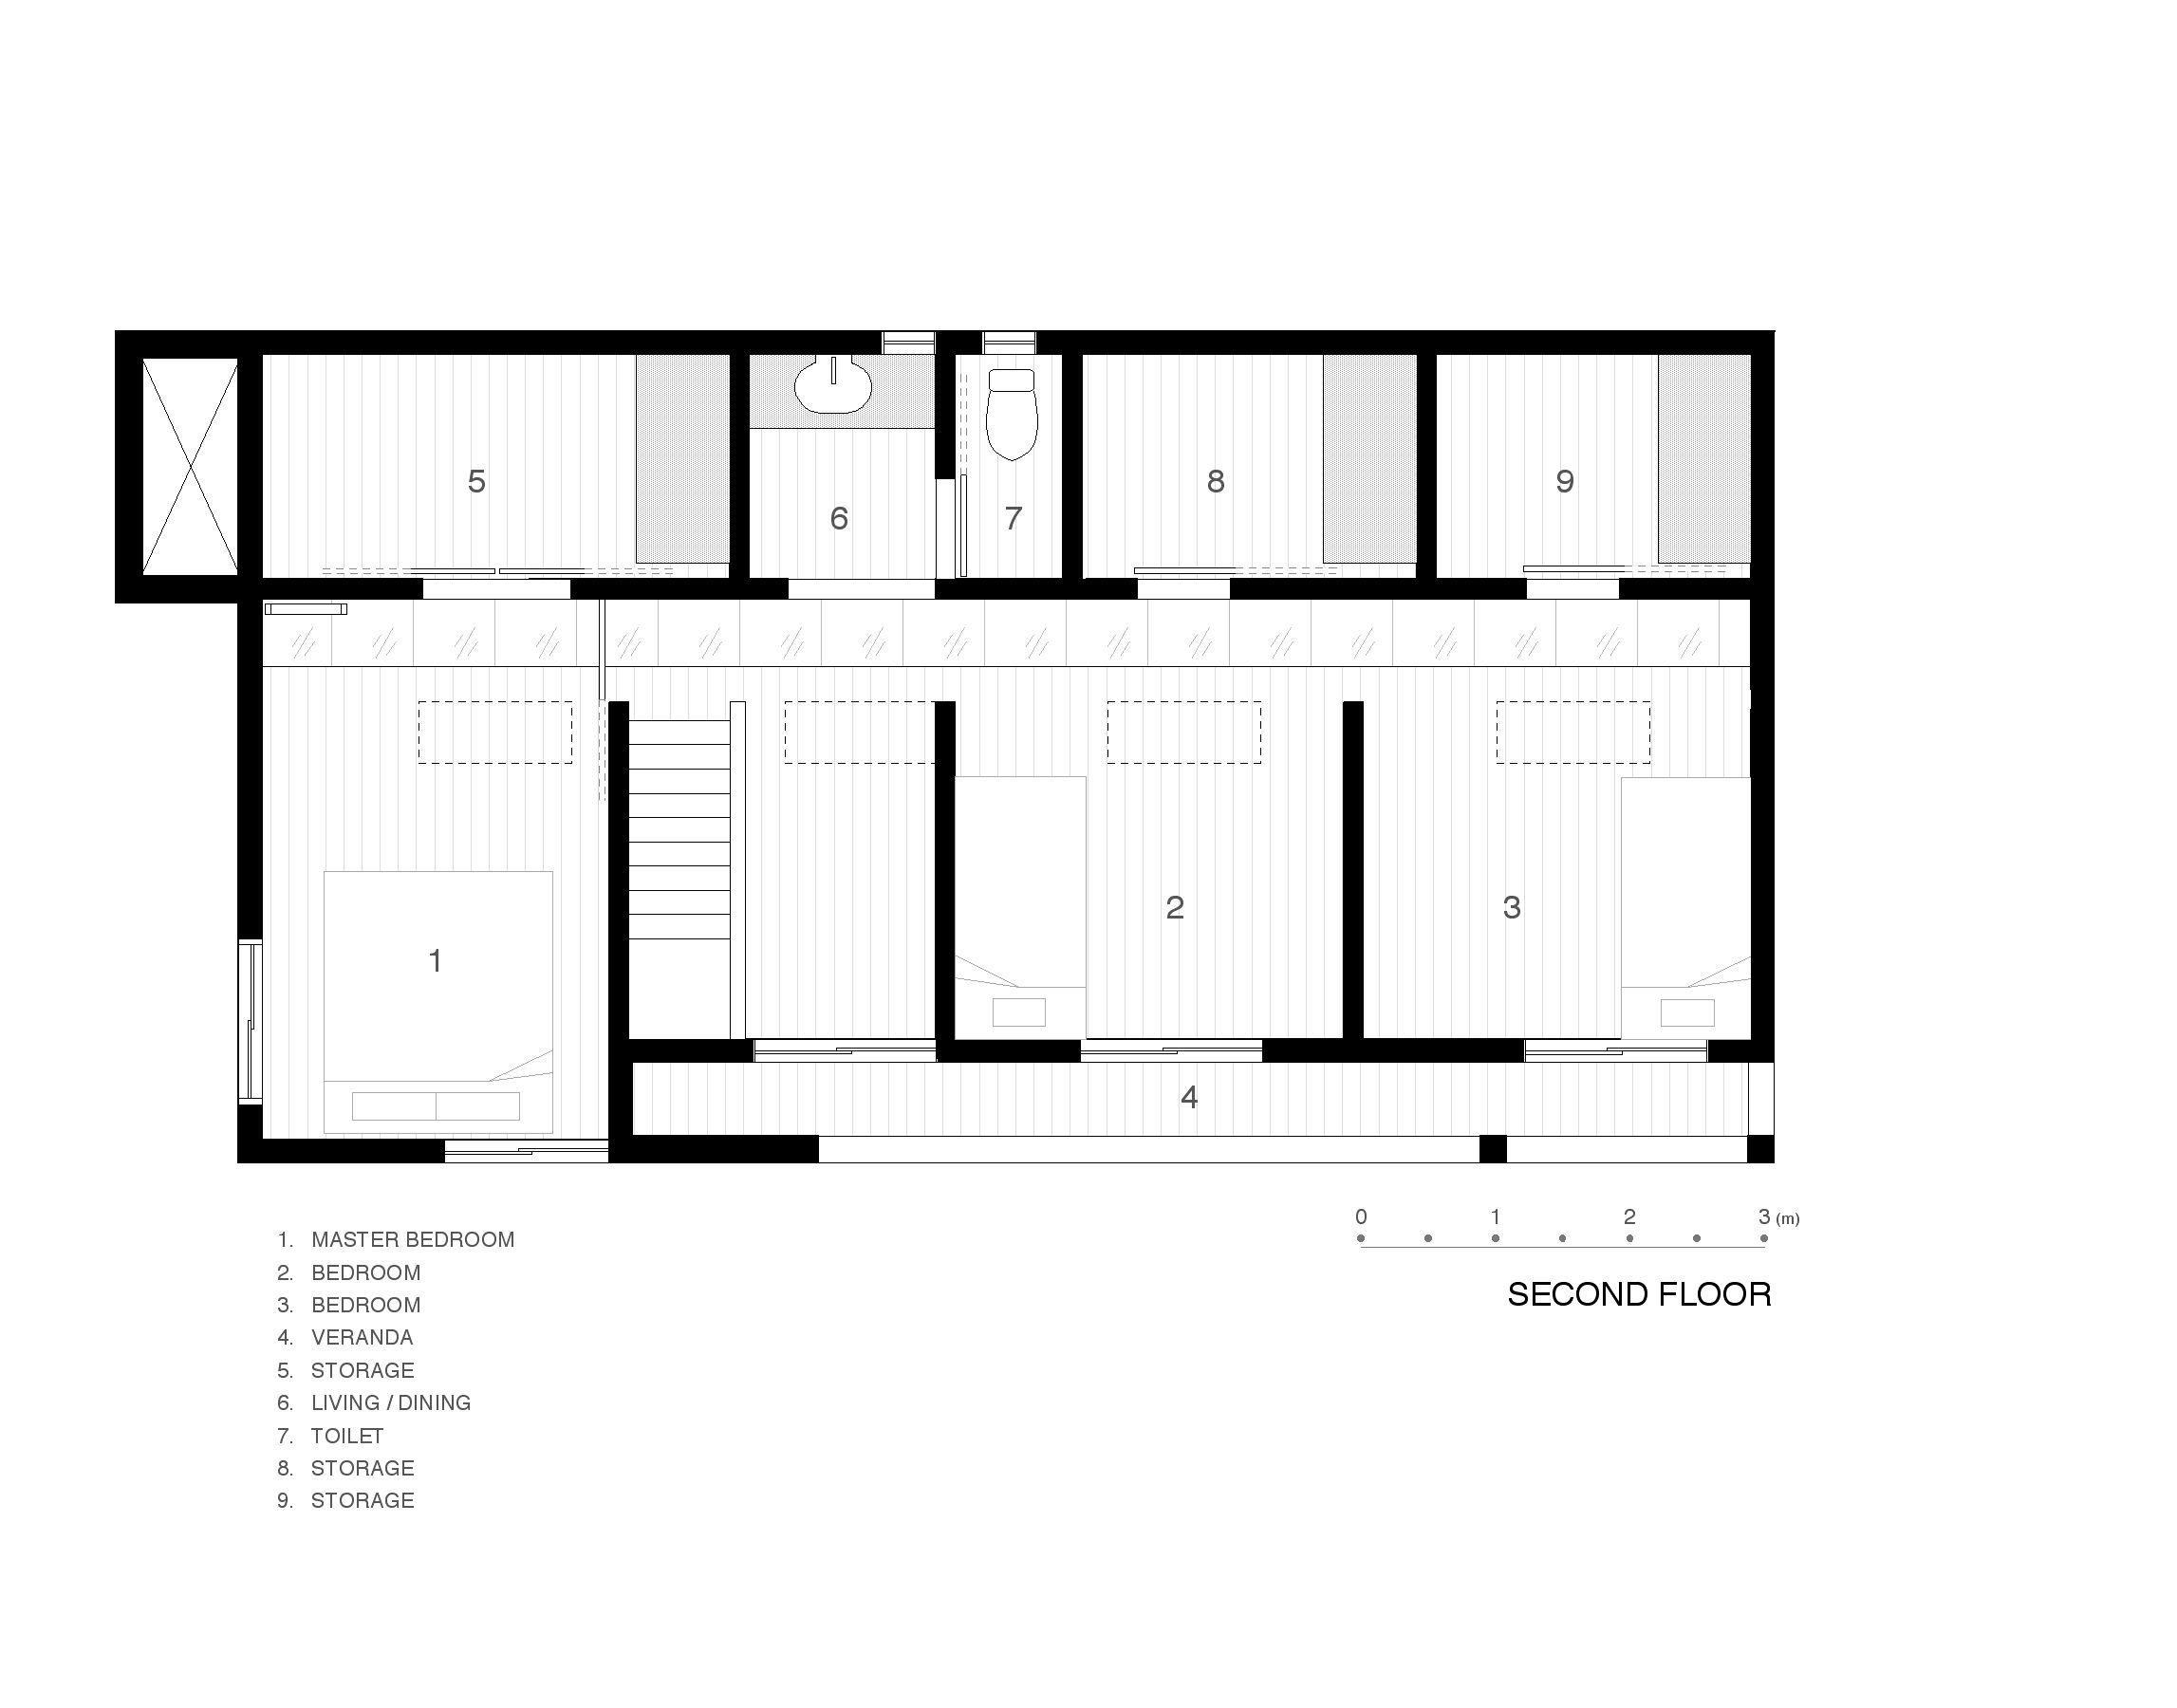 Second Floor Plan by Junko Yamamoto